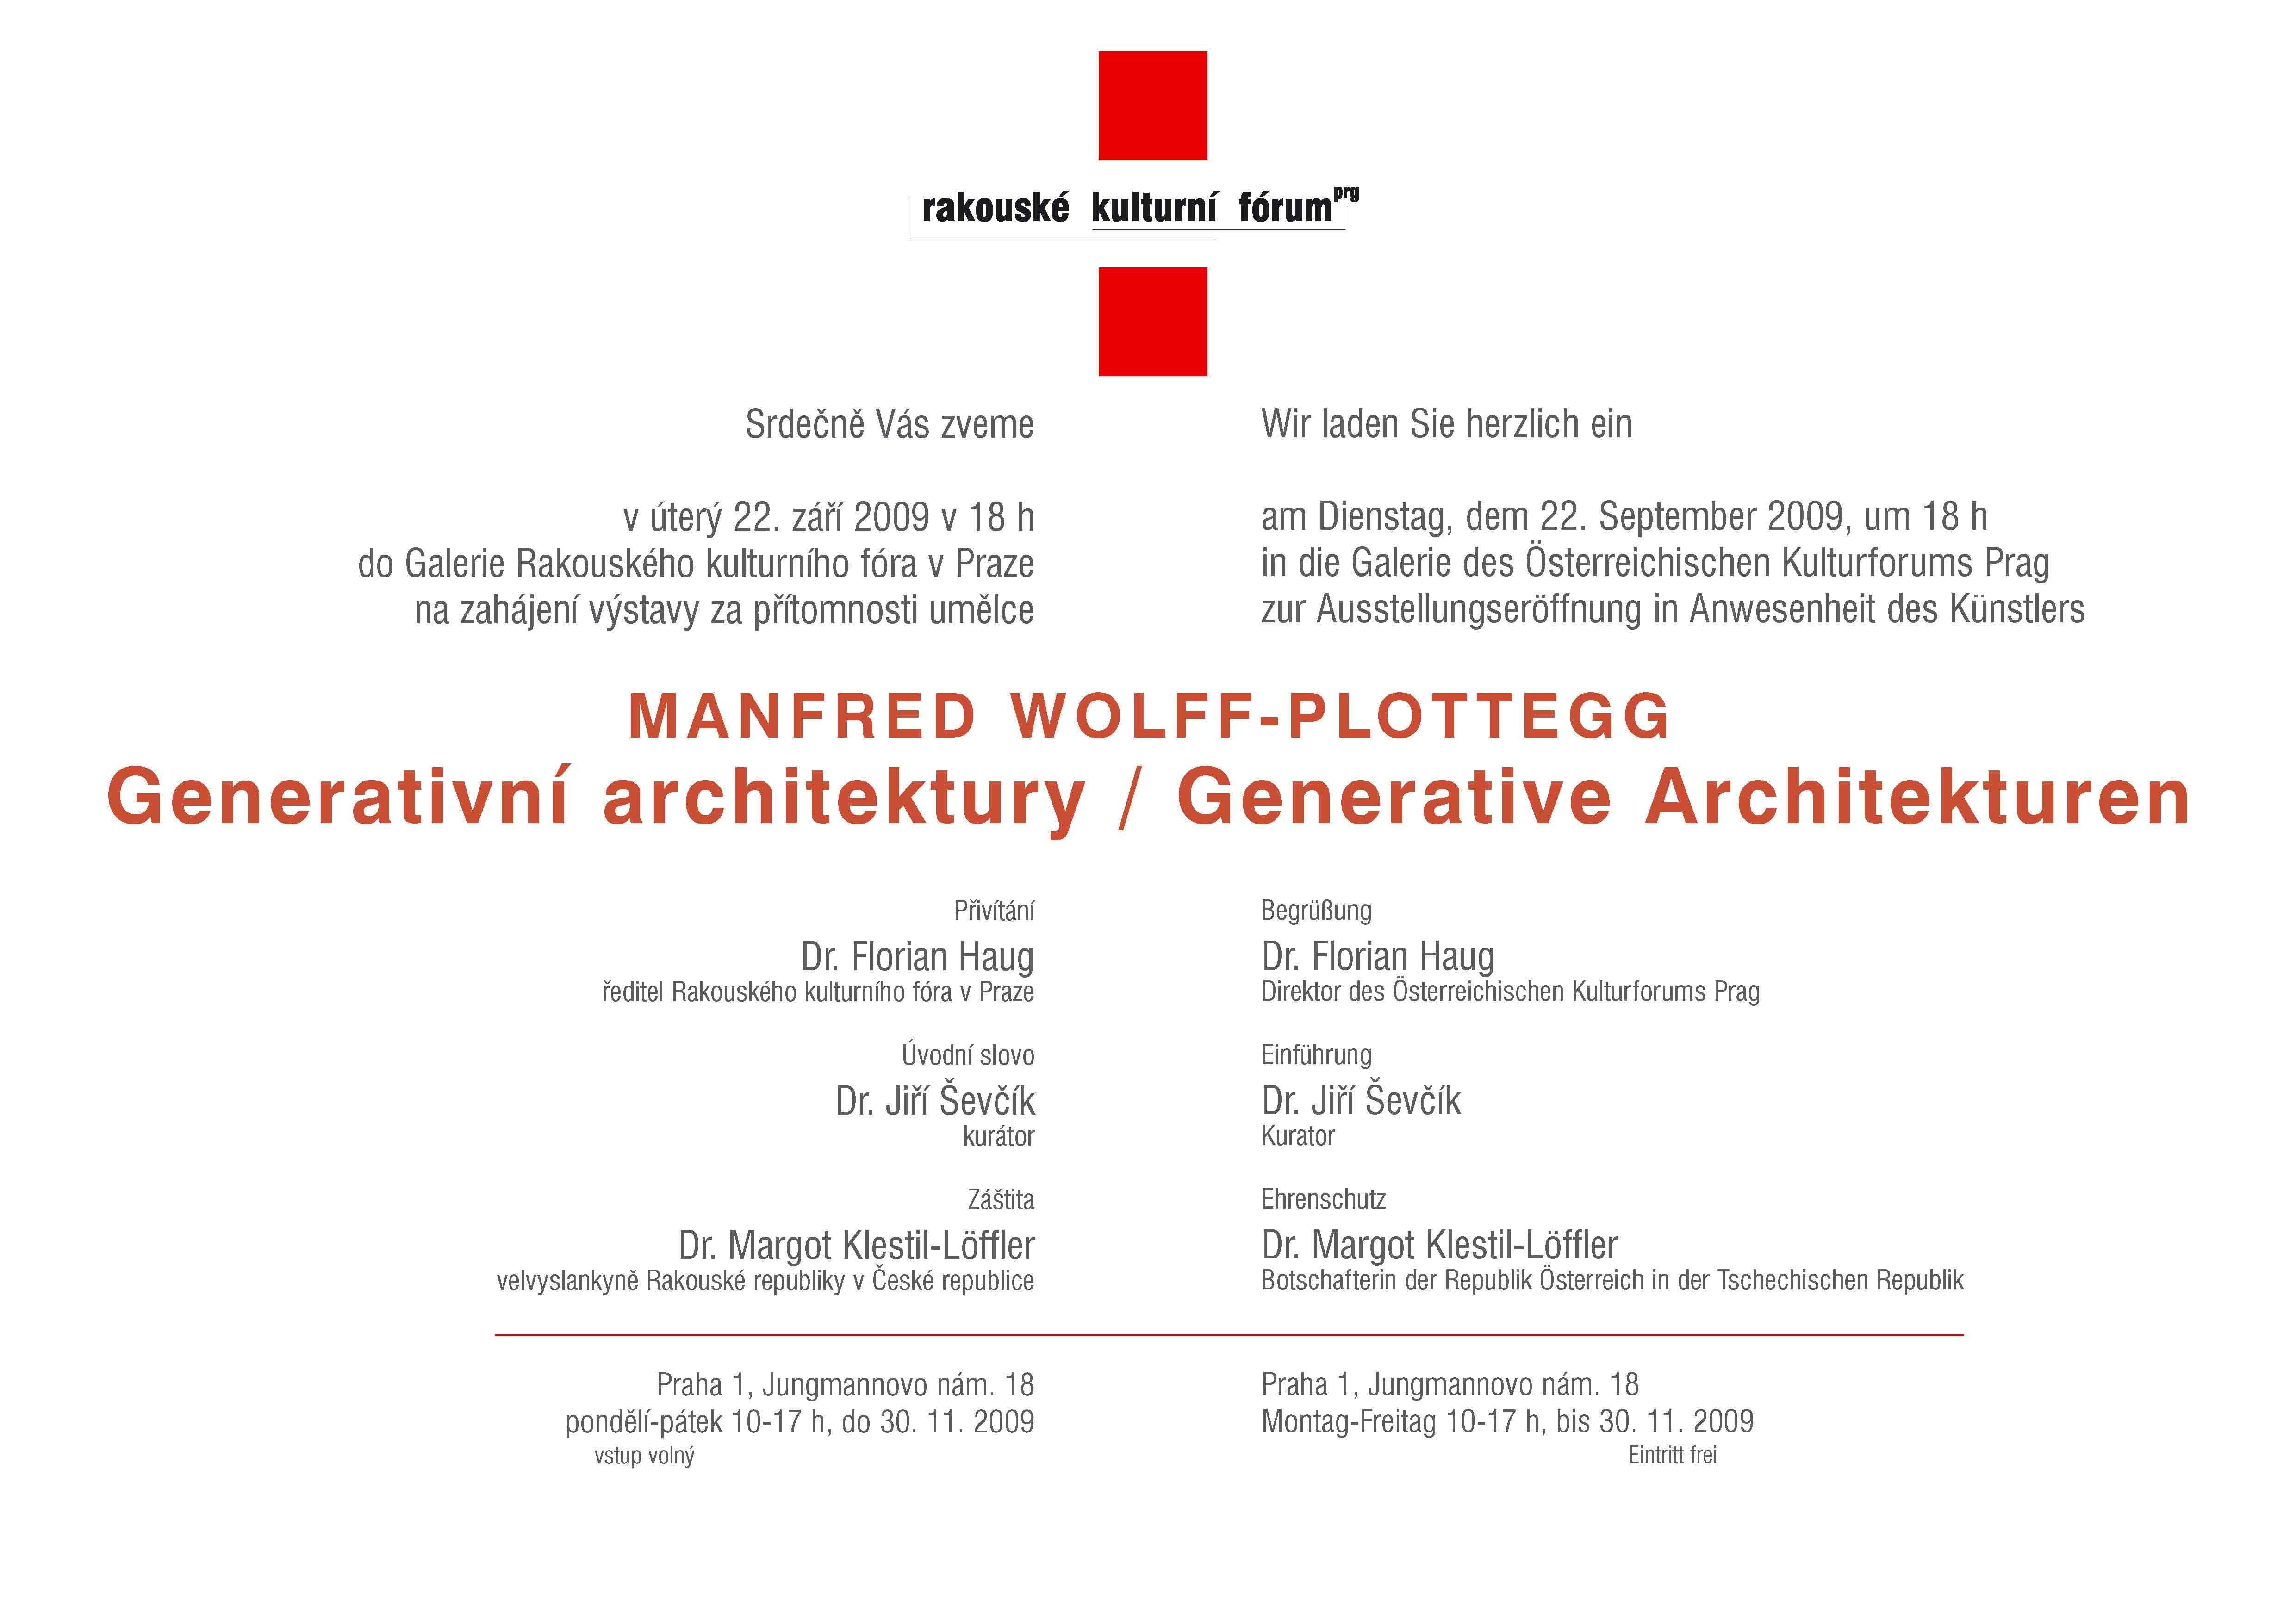 Generativní Architektury Prag 2009